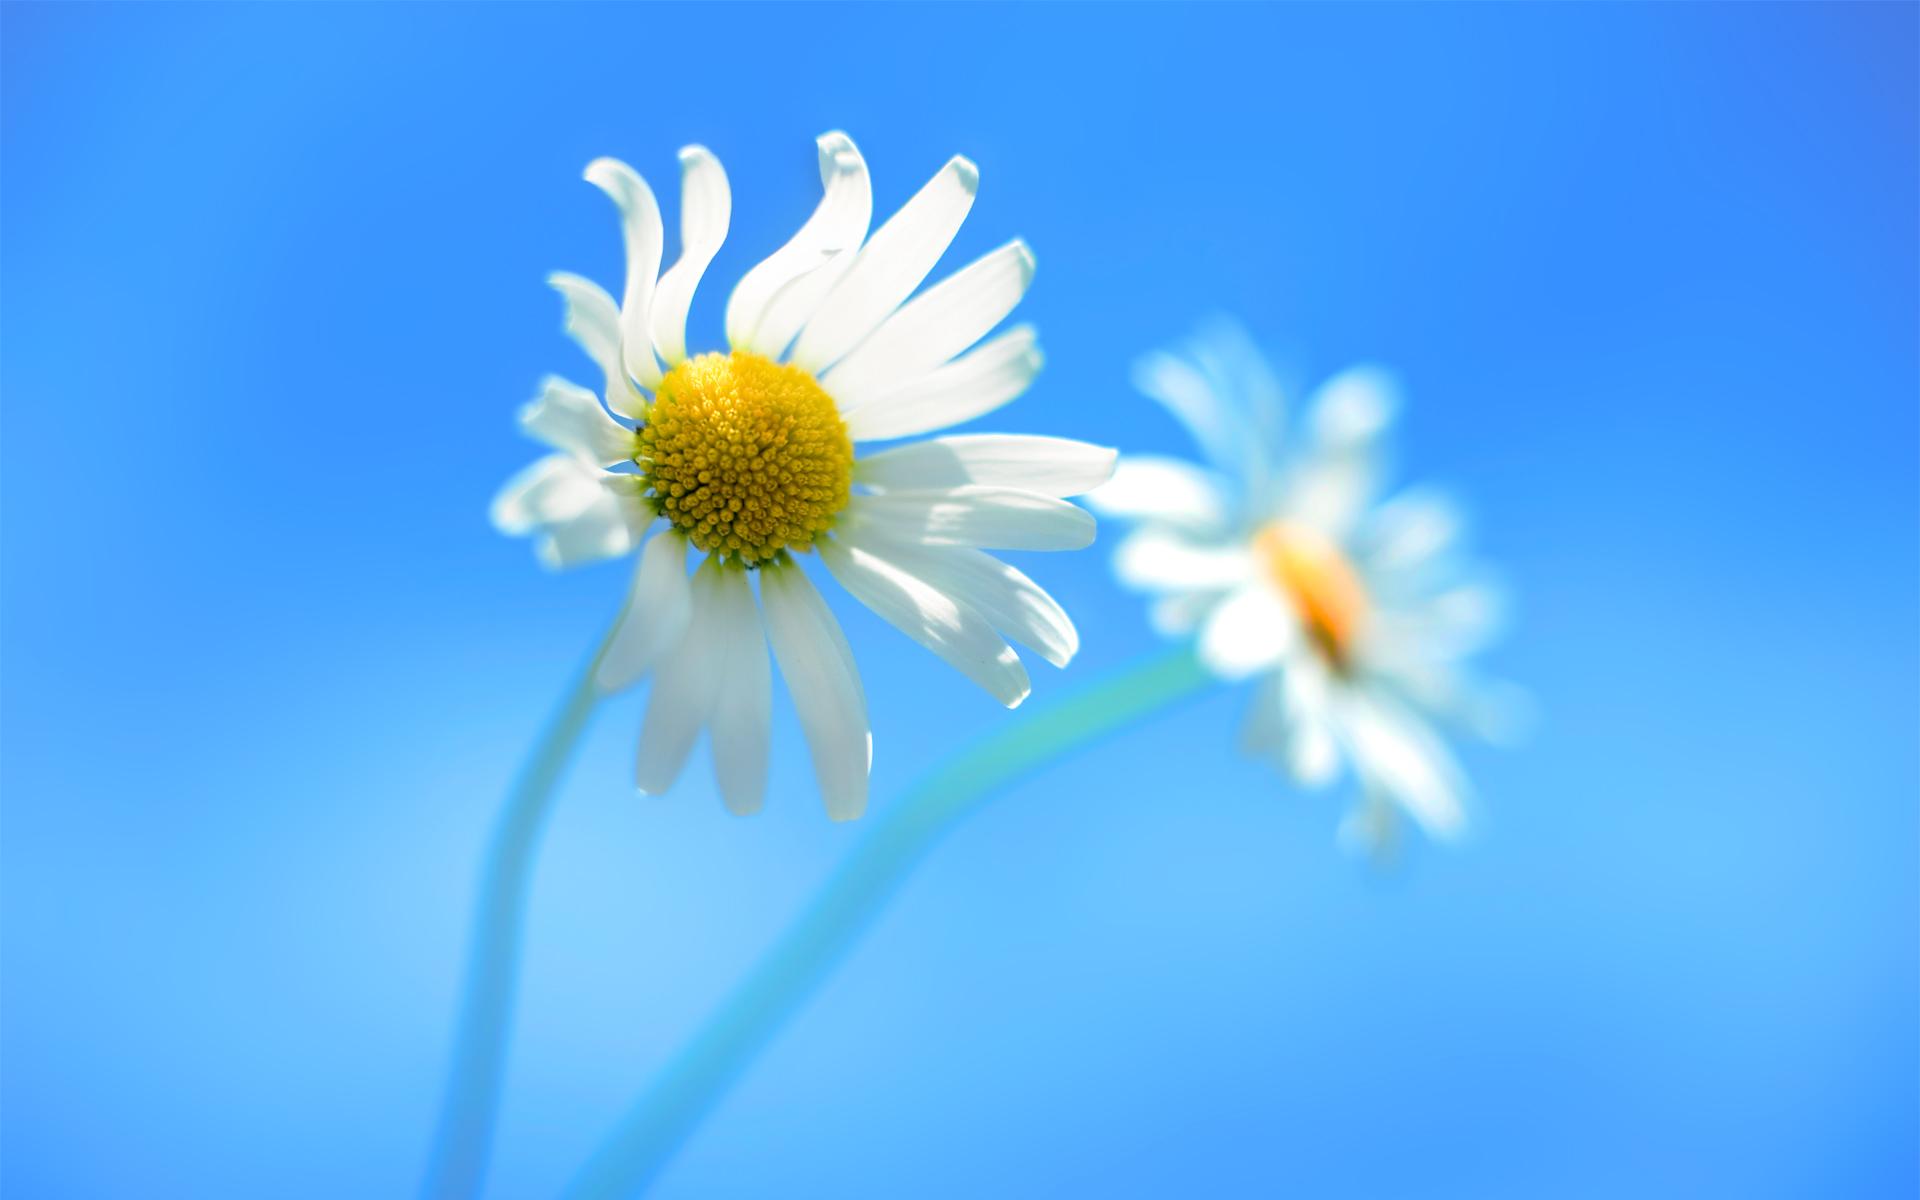 27 Flower Wallpapers For Windows 10 On Wallpapersafari